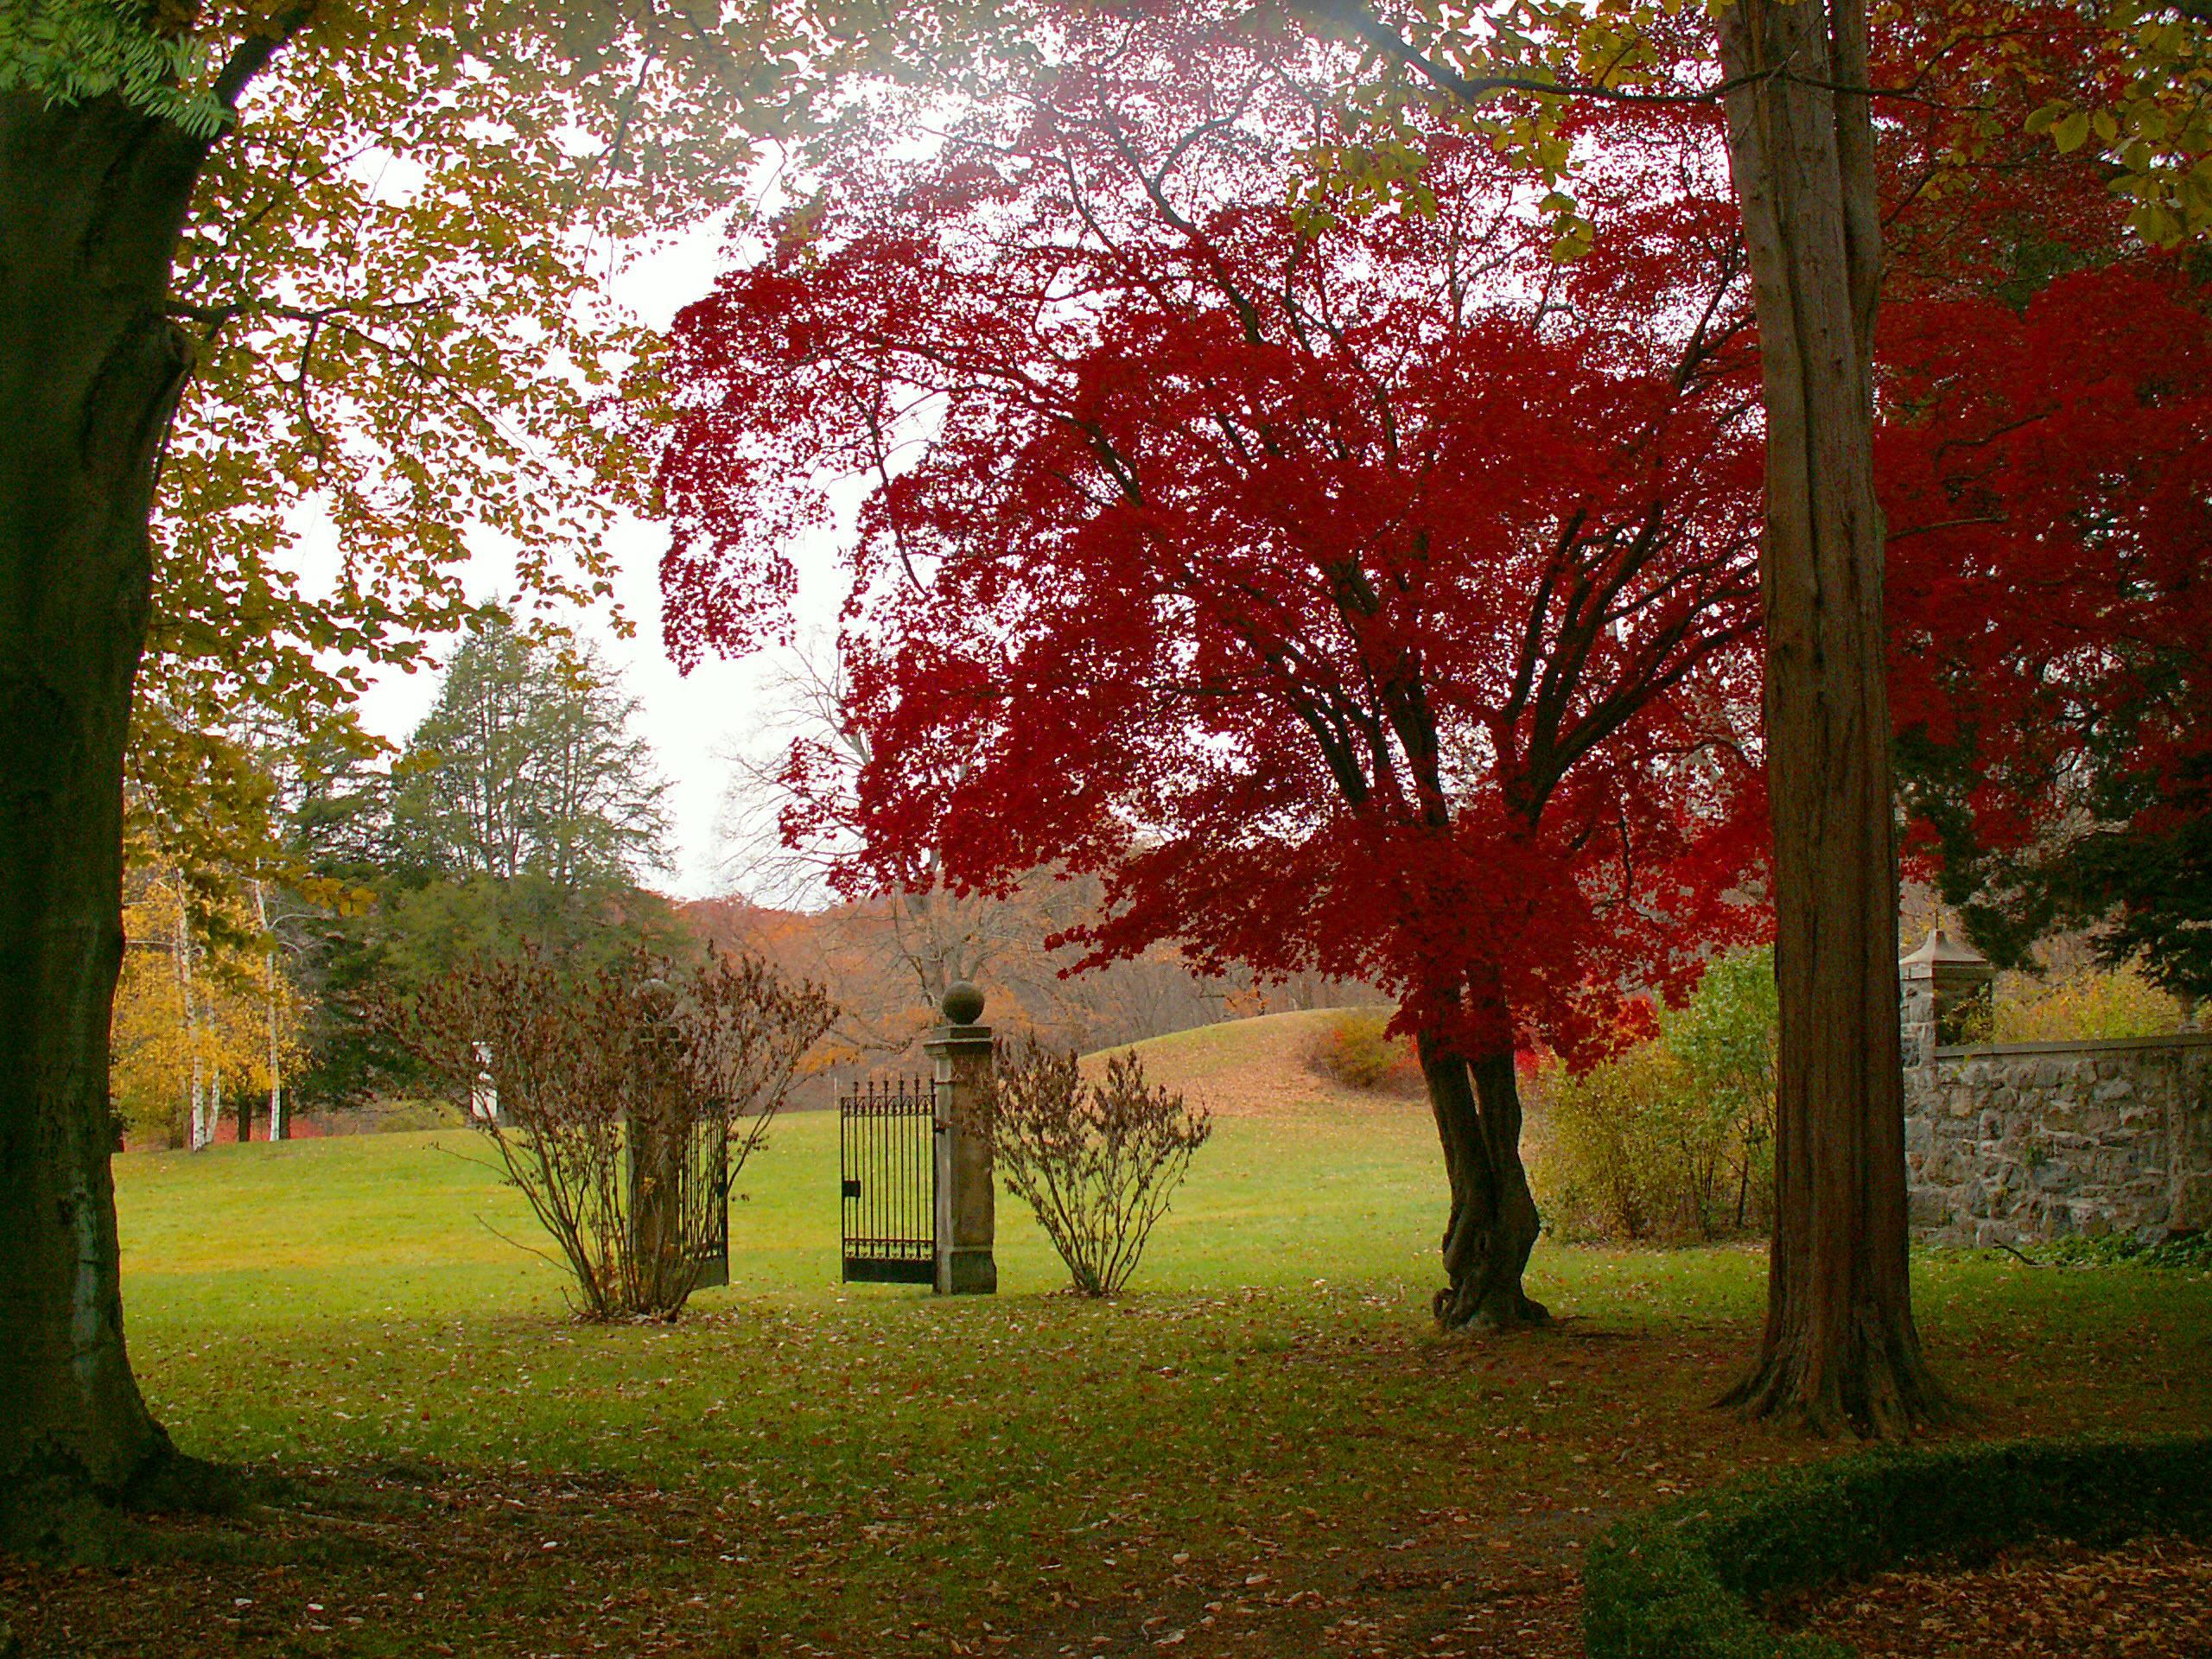 hintergrundbilder park rot baum sch n japanisch ahorn tor nj ringwood 2560x1920. Black Bedroom Furniture Sets. Home Design Ideas